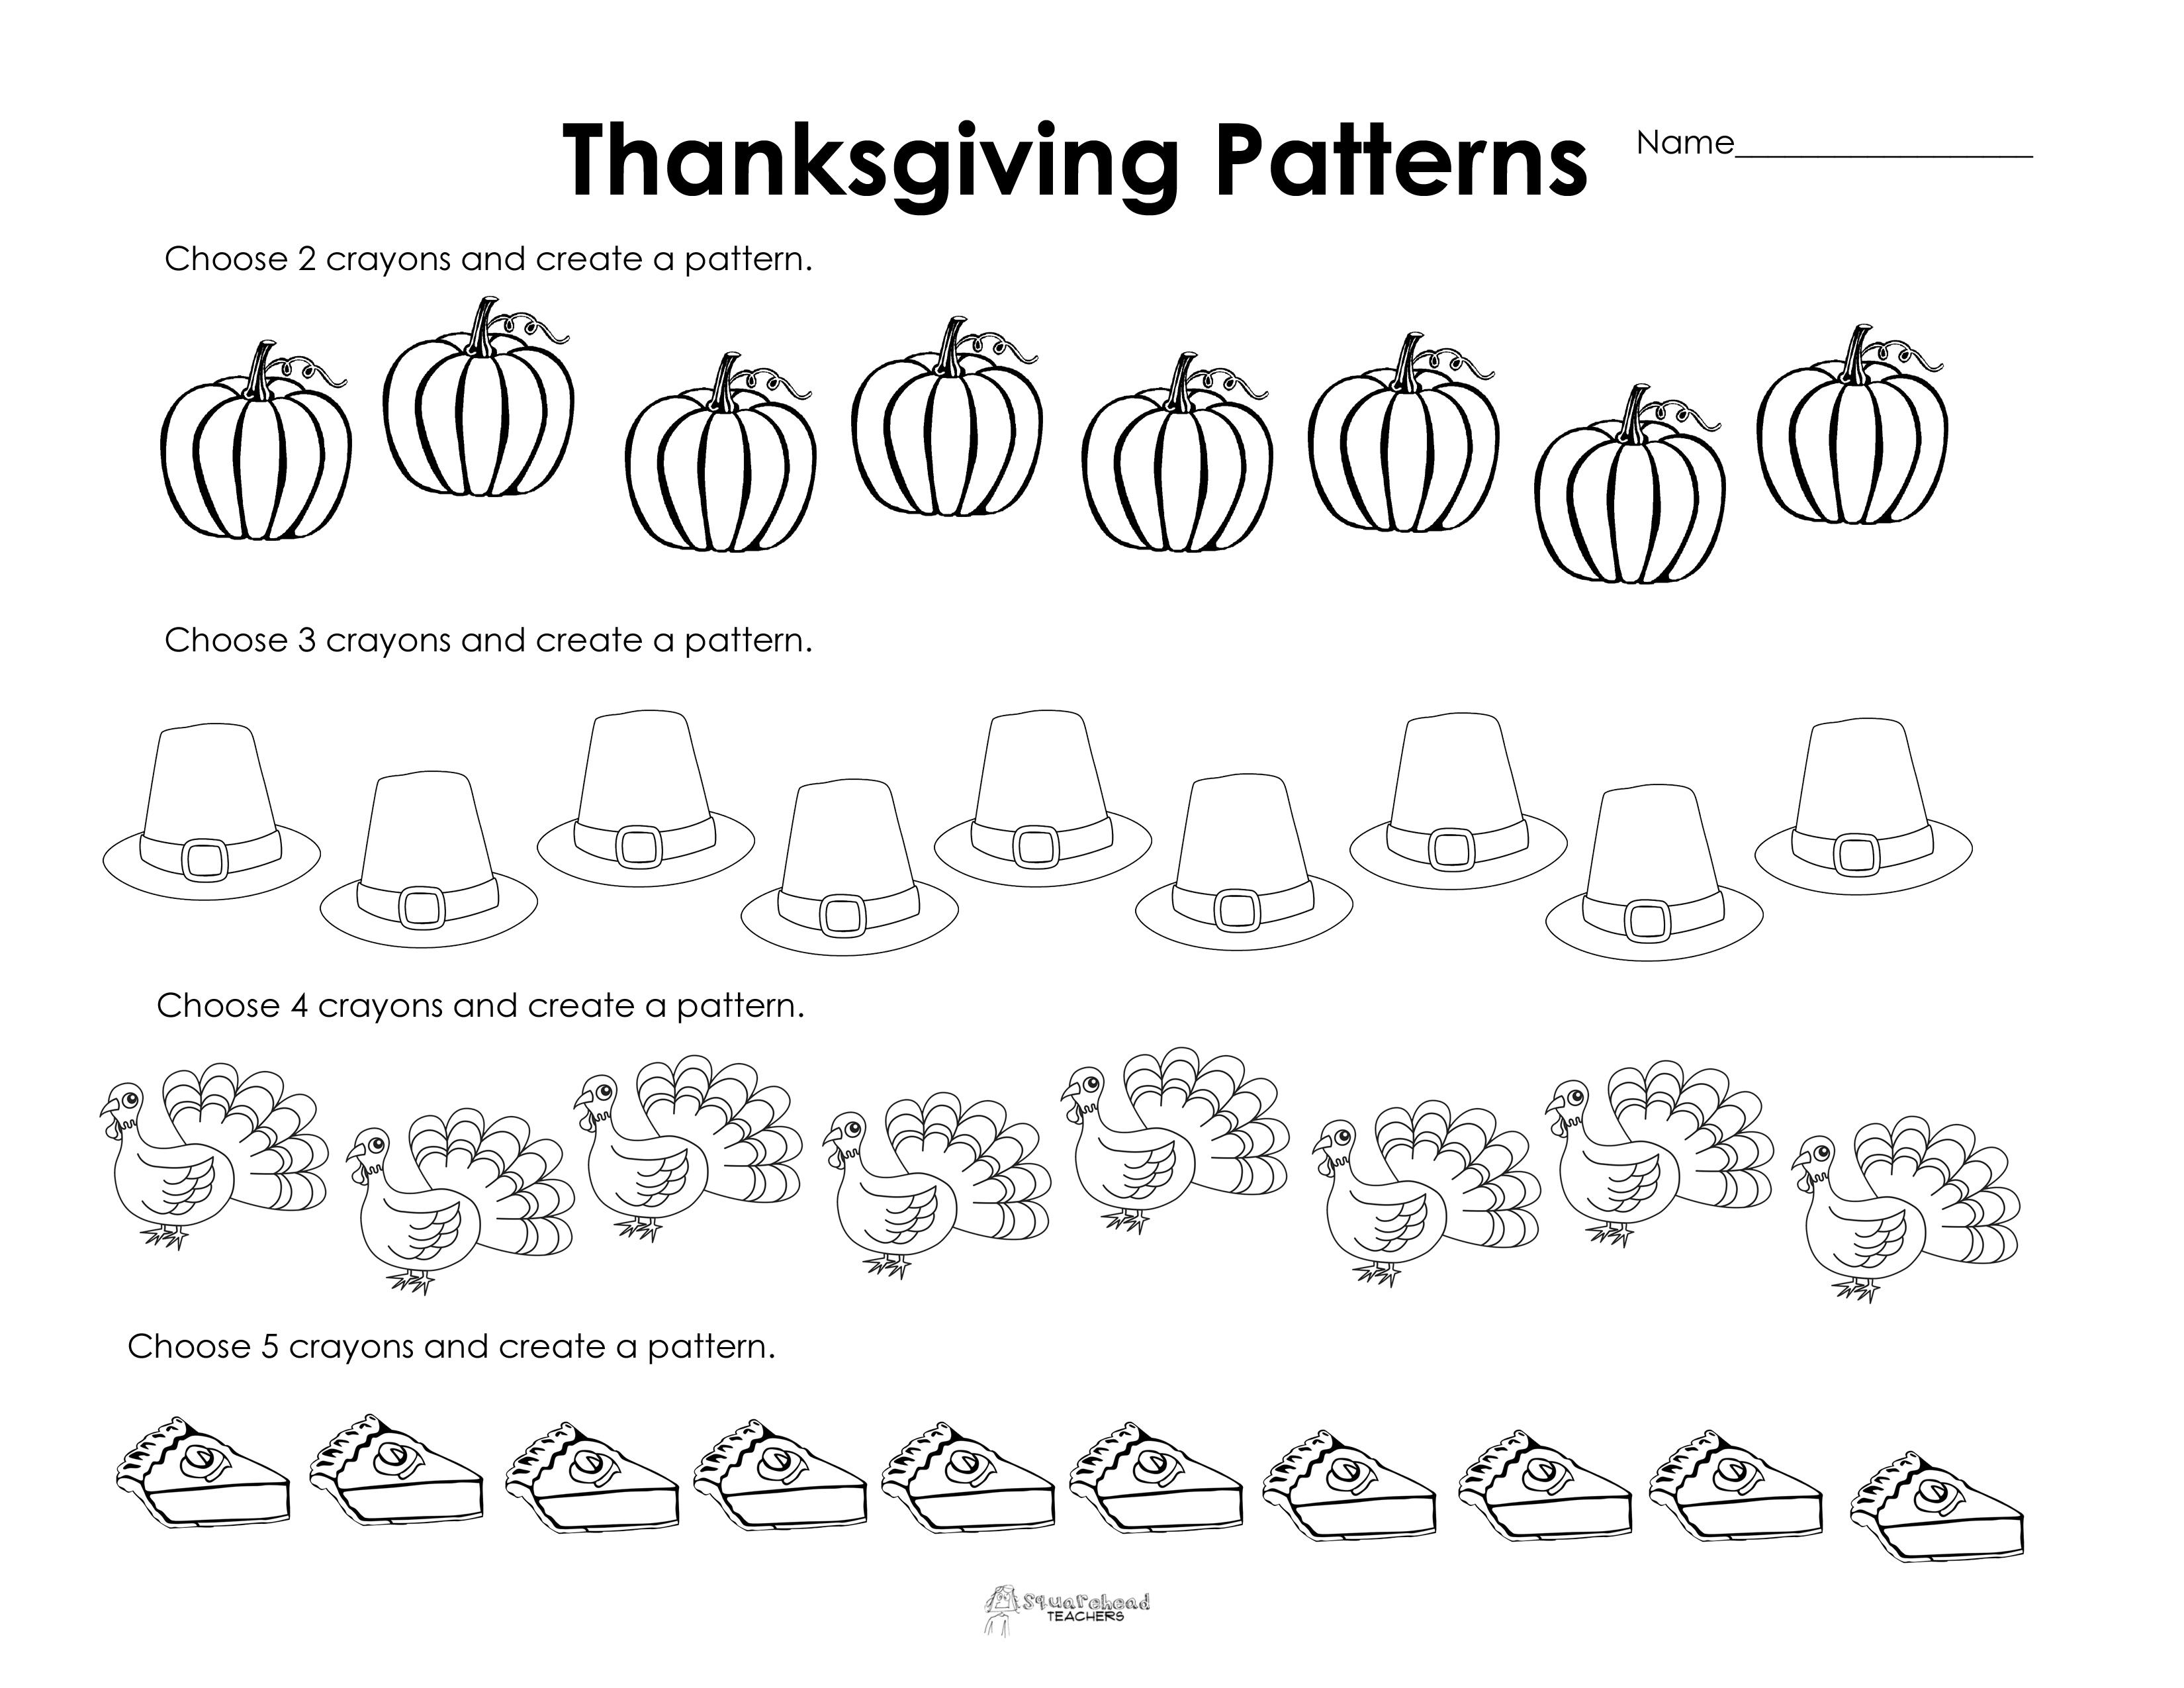 Making Patterns: Thanksgiving Style (Free Worksheet!) | Squarehead | Free Printable Preschool Thanksgiving Worksheets